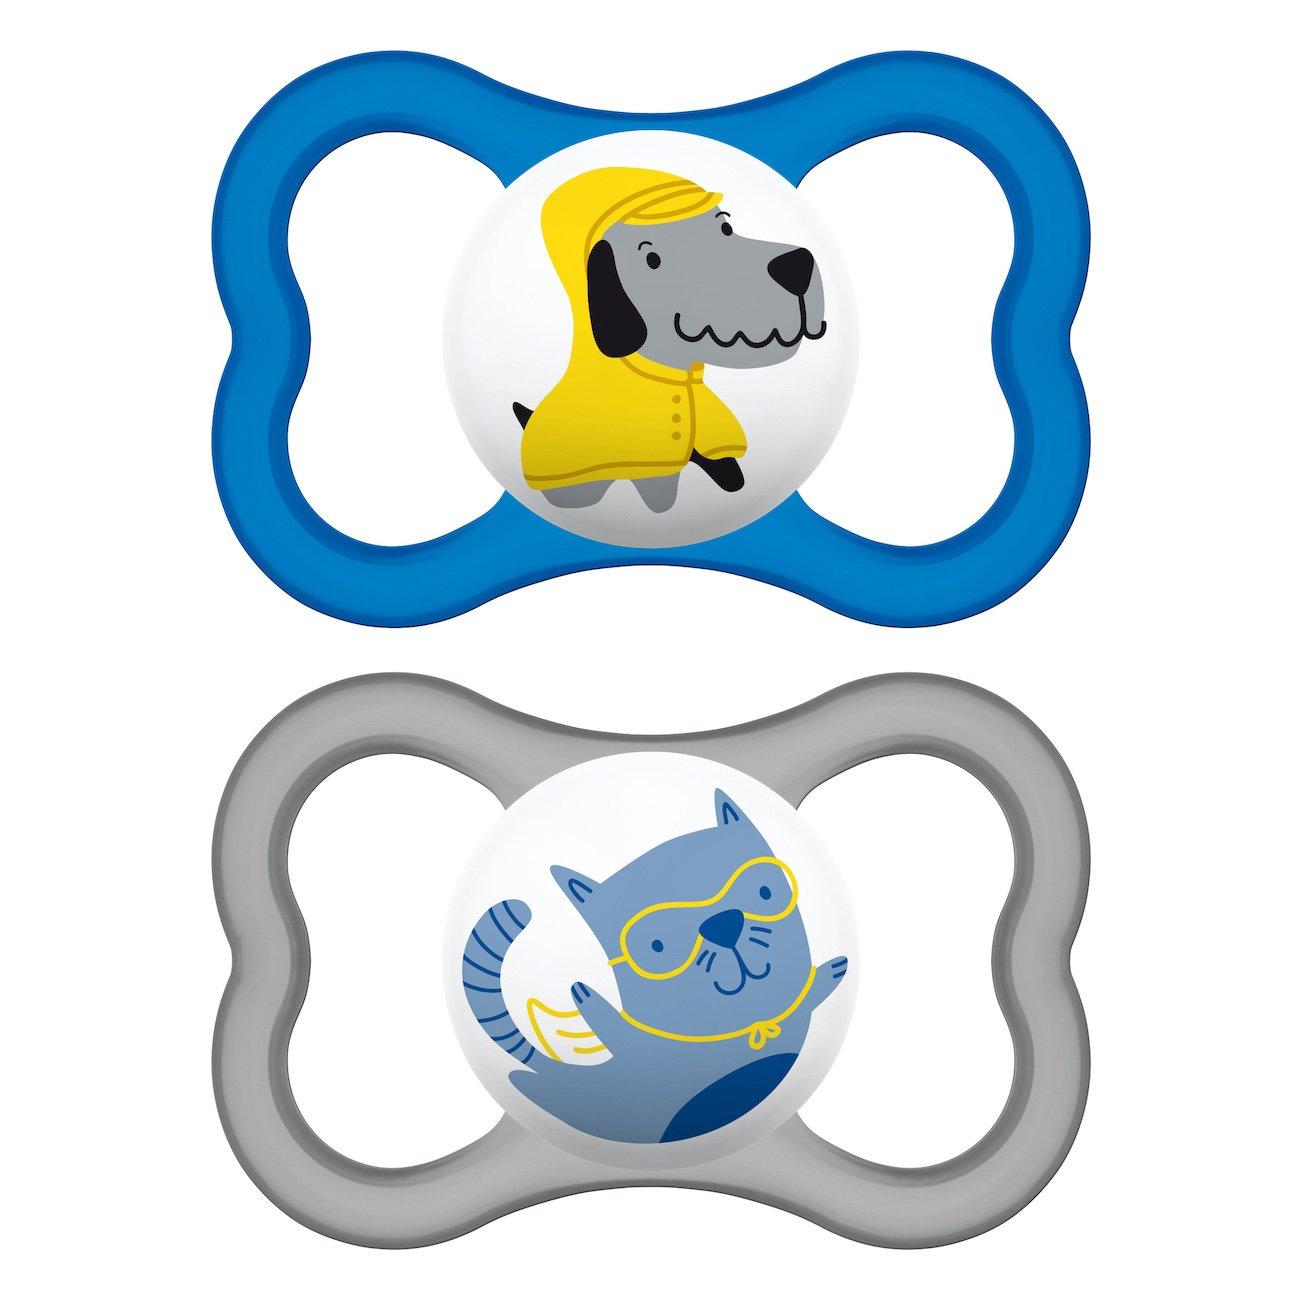 Mam Air Ορθοδοντική Πιπίλα Καουτσούκ Κωδ 216L από 6 Έως 16 Μηνών 2 Τεμάχια – Μπλε – Γκρι